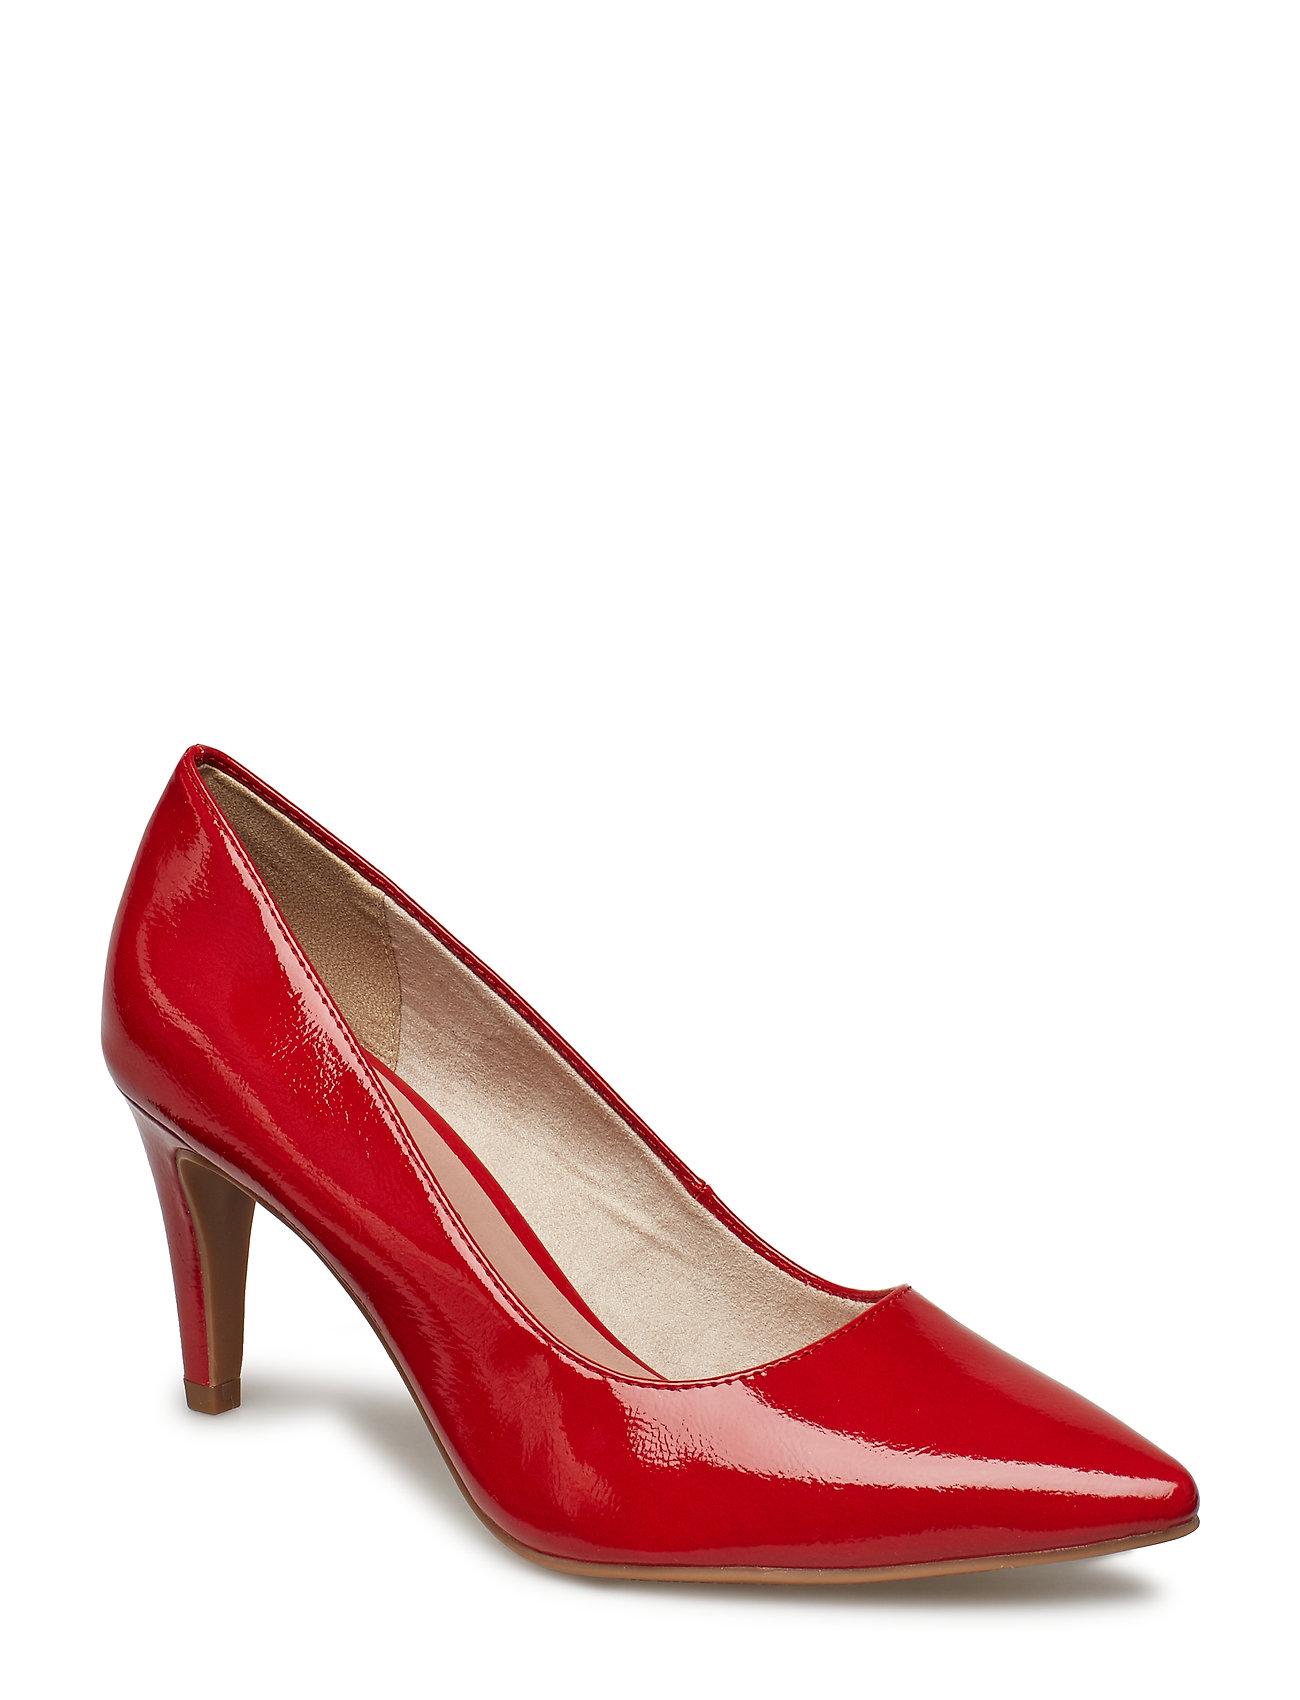 Tamaris Woms Court Shoe - CHILI PATENT